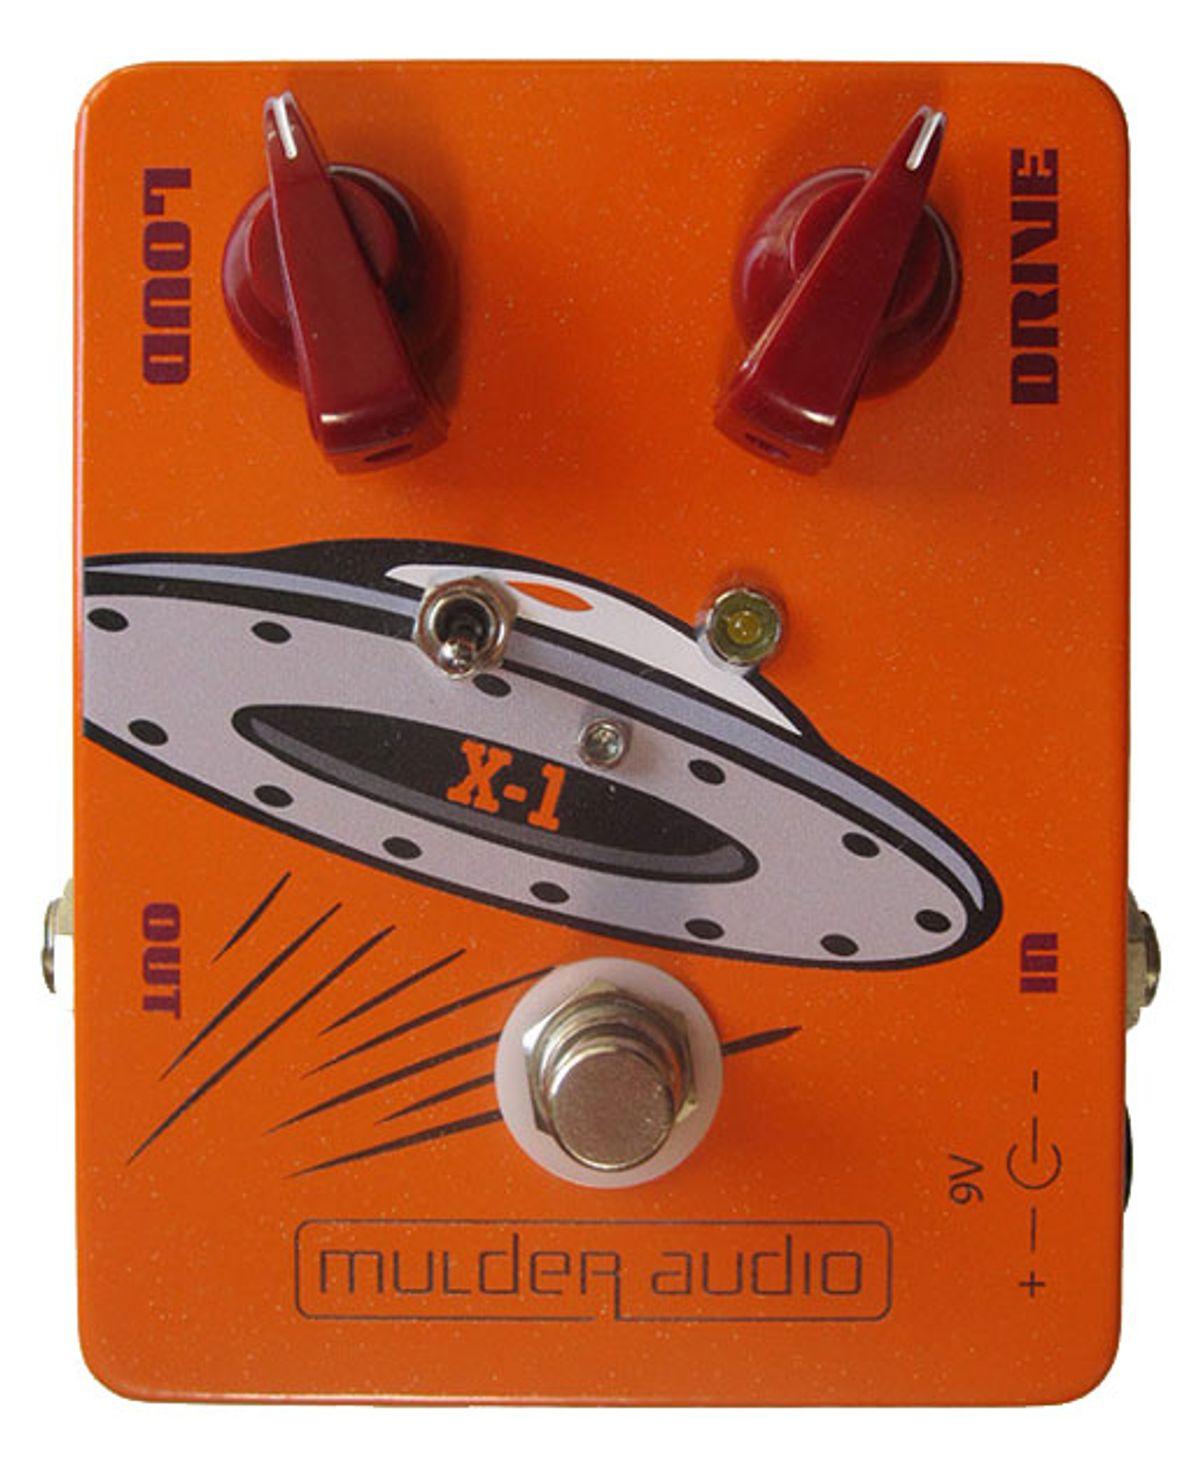 Mulder Audio X-1 Review